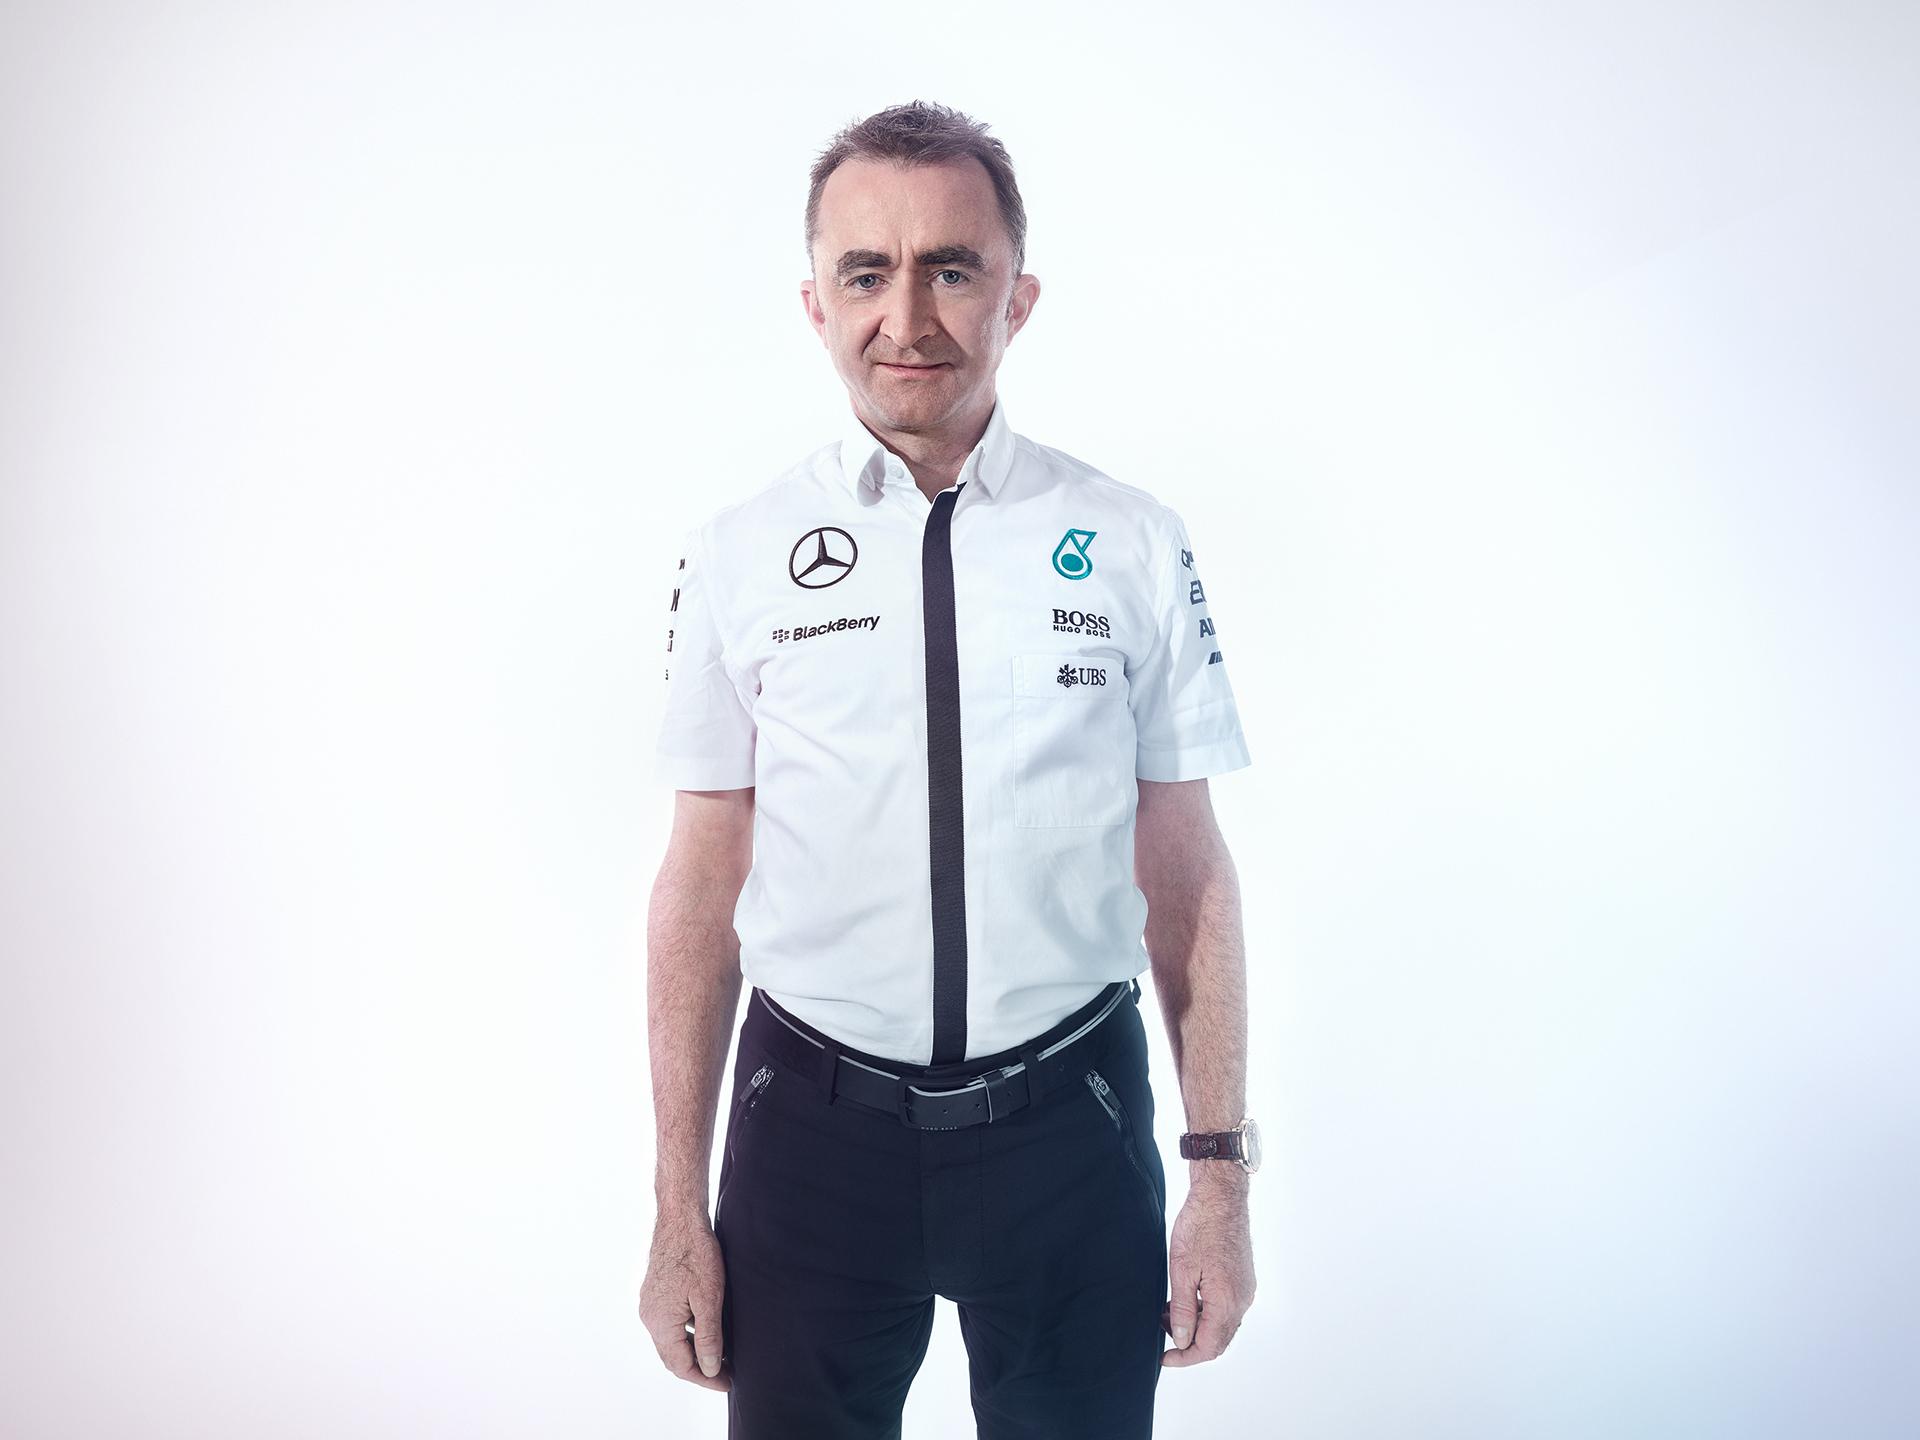 Mercedes Benz, Formel 1, F1, Barcelona, circuit de catalunya, spain, amg, Anke Luckmann, www.ankeluckmann.com, trey,